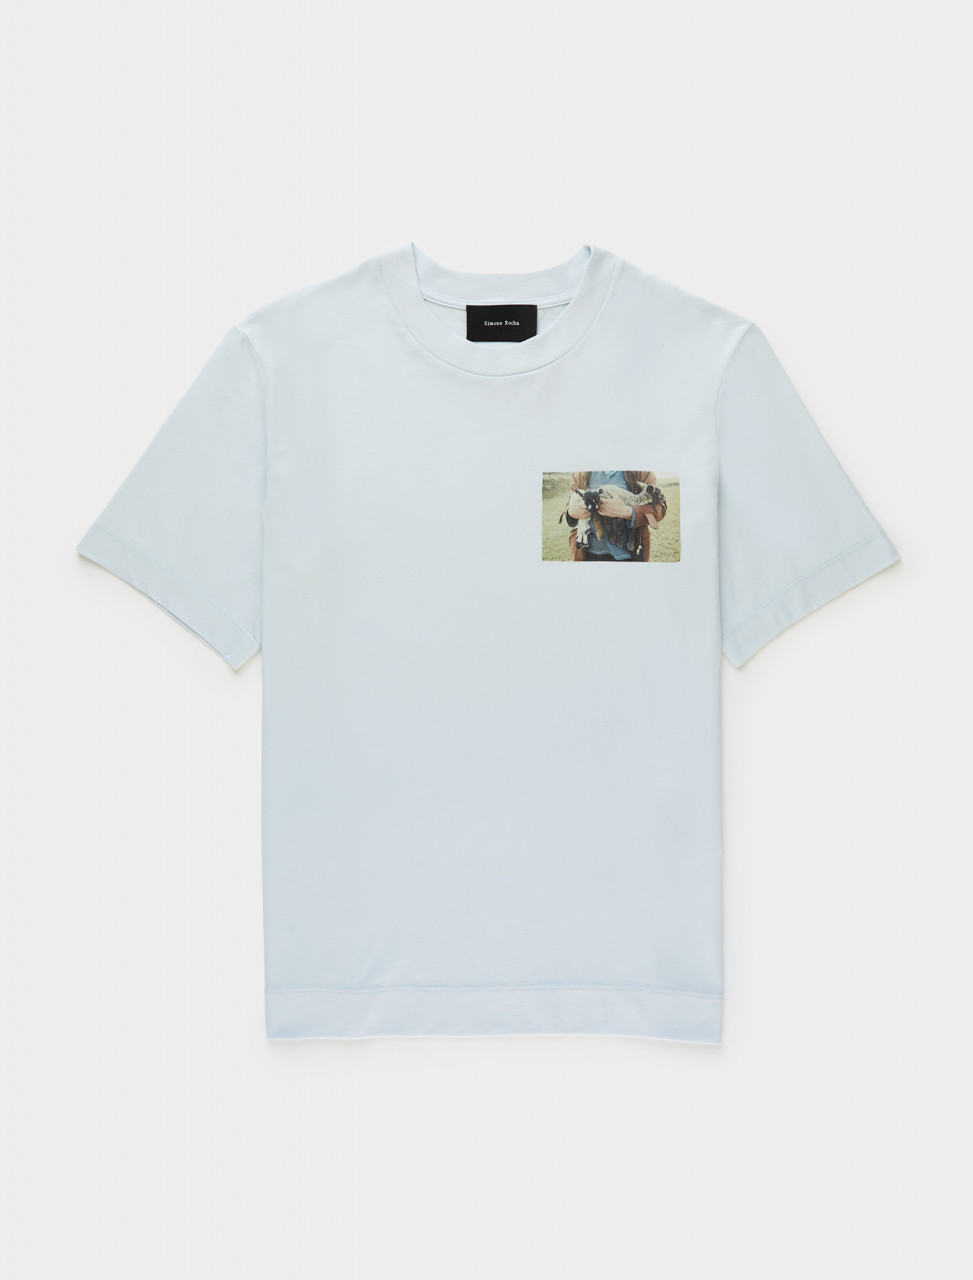 Simone Rocha Lamb Print Boy T-Shirt in Baby Blue